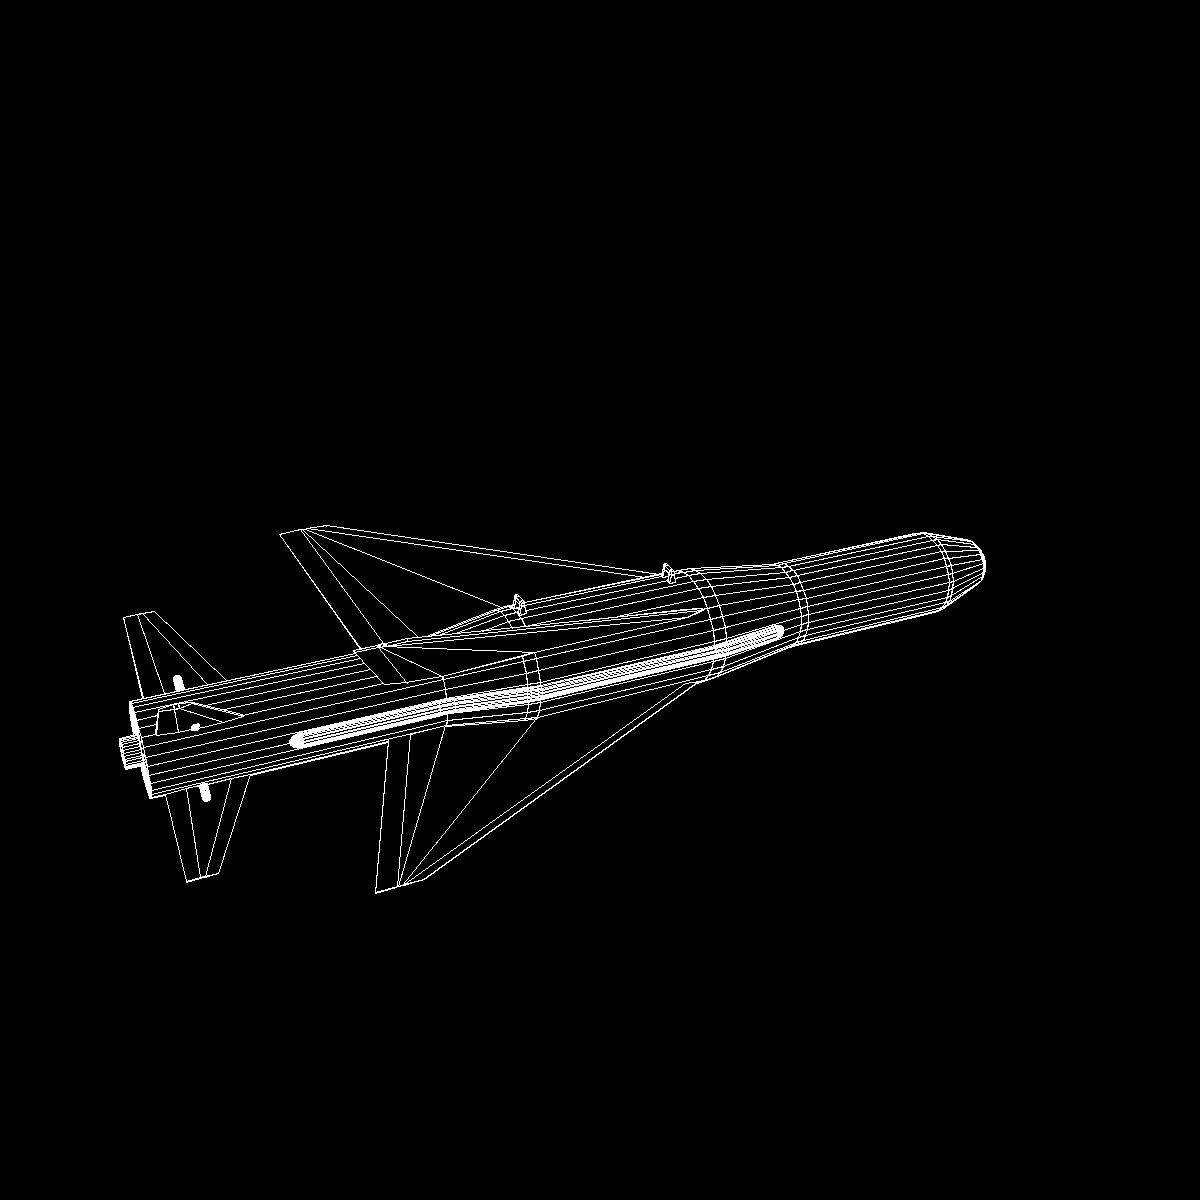 iranian agm-379 zoobin asm missile 3d model 3ds dxf fbx blend cob dae x obj 150596